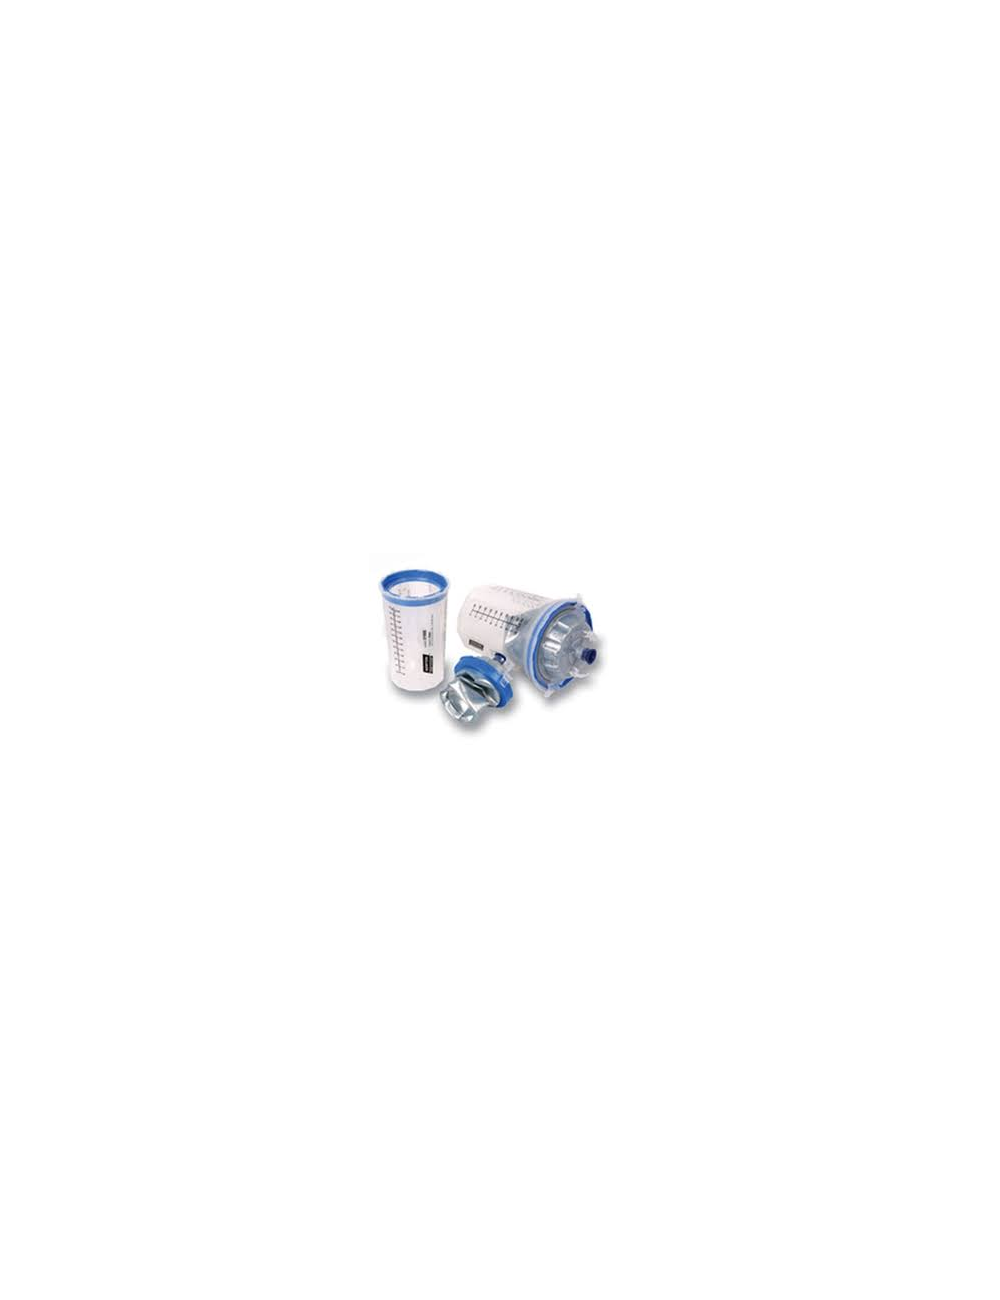 48 NEW GPS Kit small 250 ml 125 µ